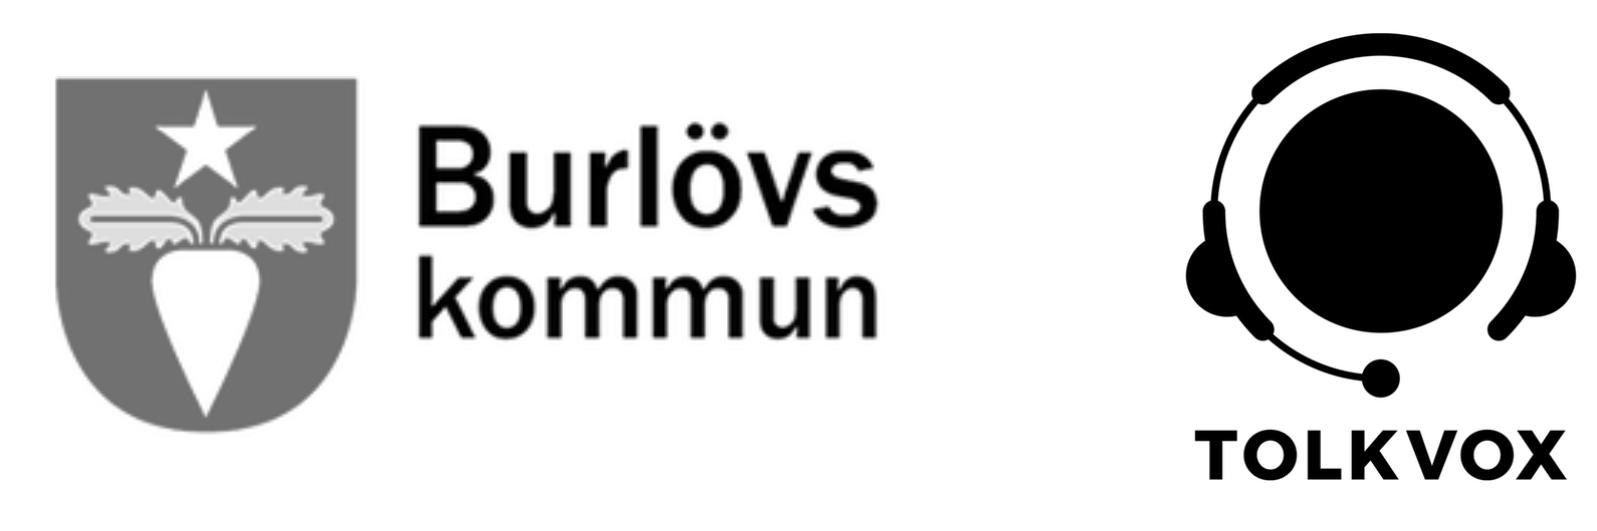 burlov_tolkvo.png